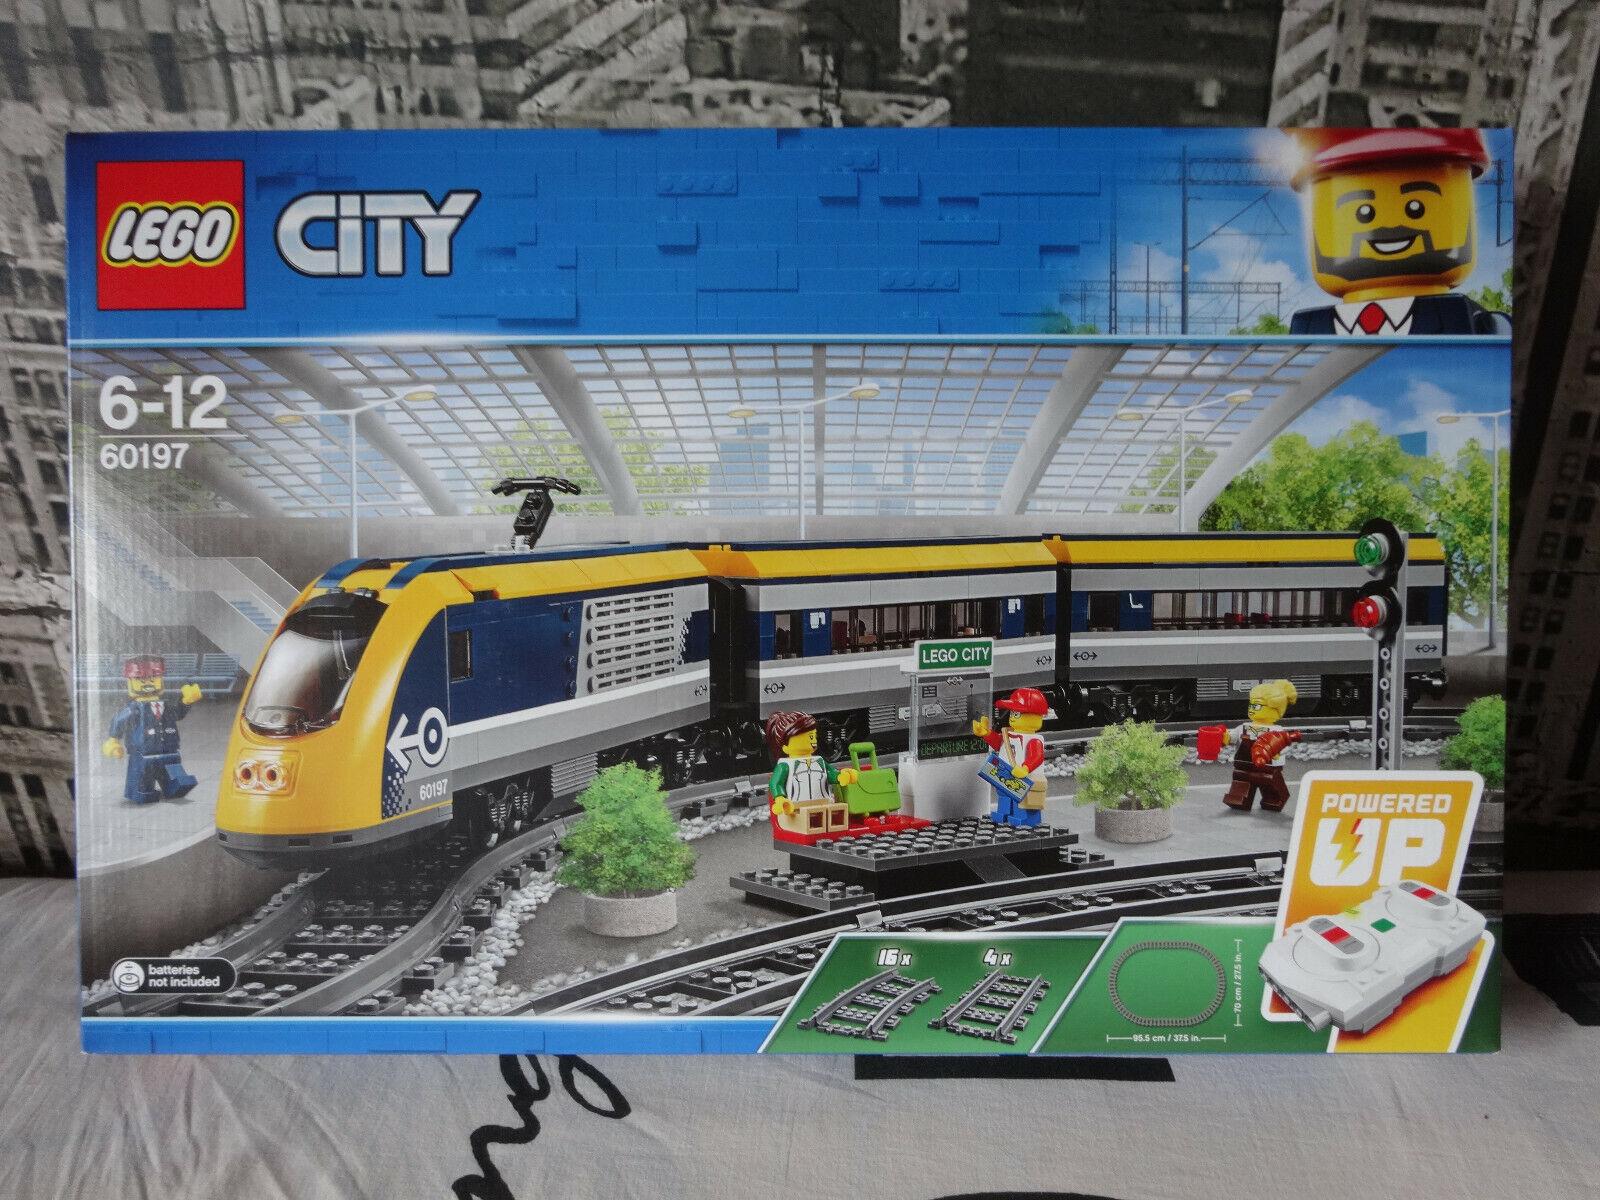 Lego 60197 - Lego City tren de pasajeros -2